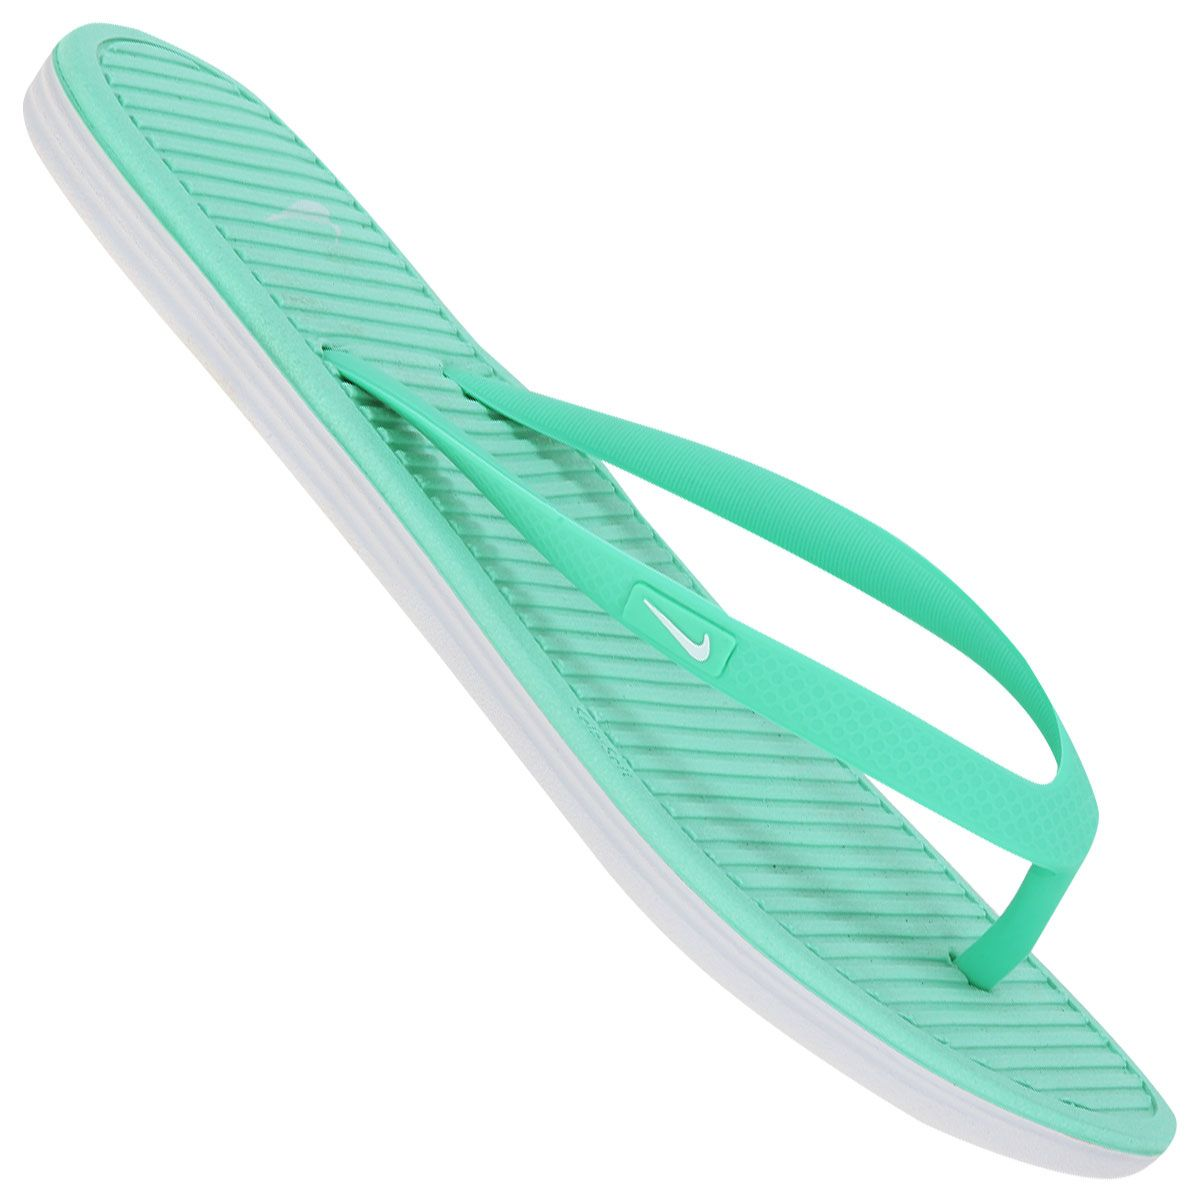 acdd4f0c4 Chinelo Nike - Feminino | Chinelos